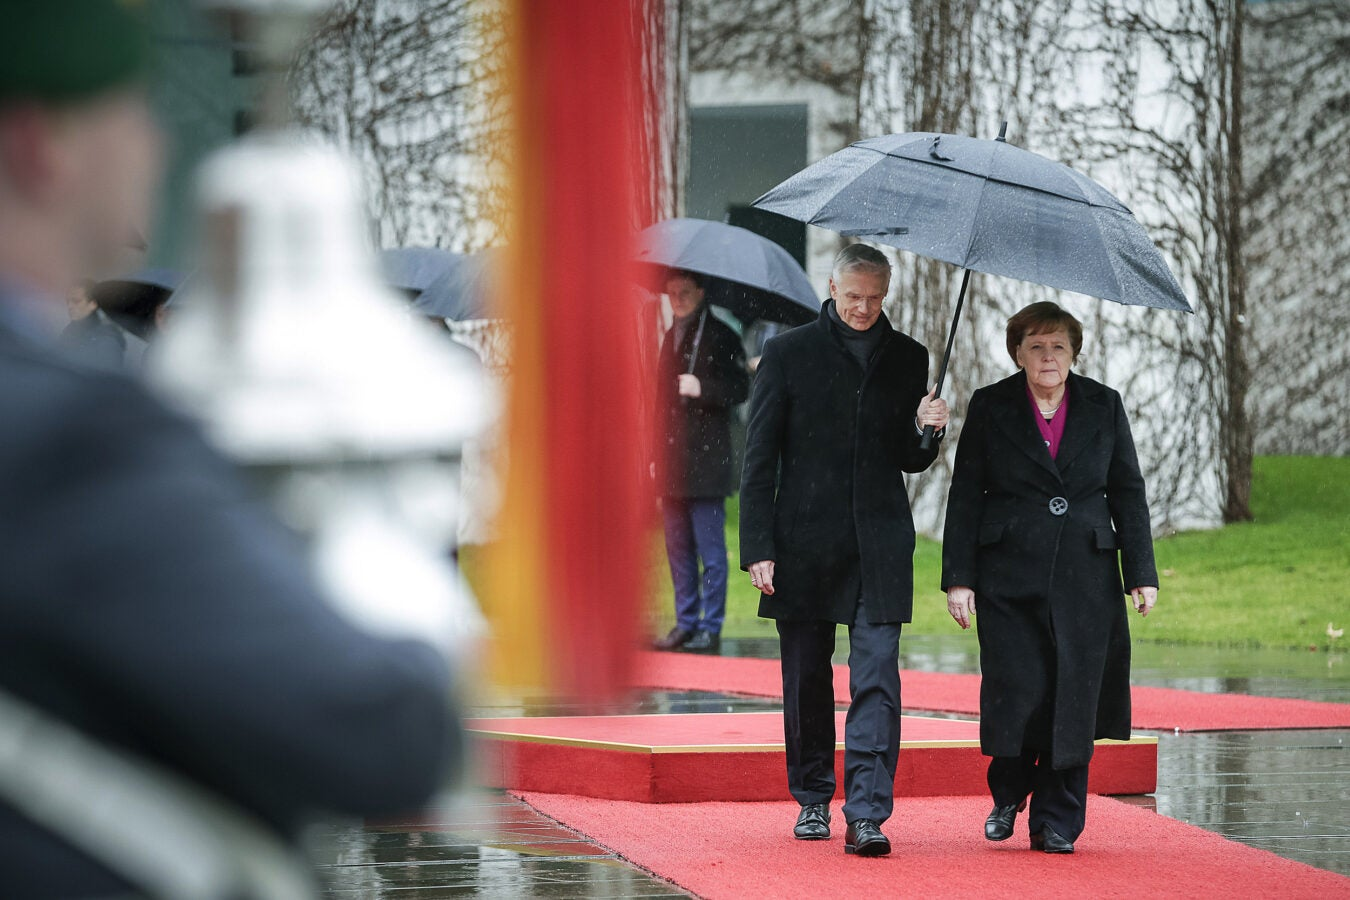 Angela Merkel walks under an umbrella with Krisjanis Karins, prime minister of Latvia.